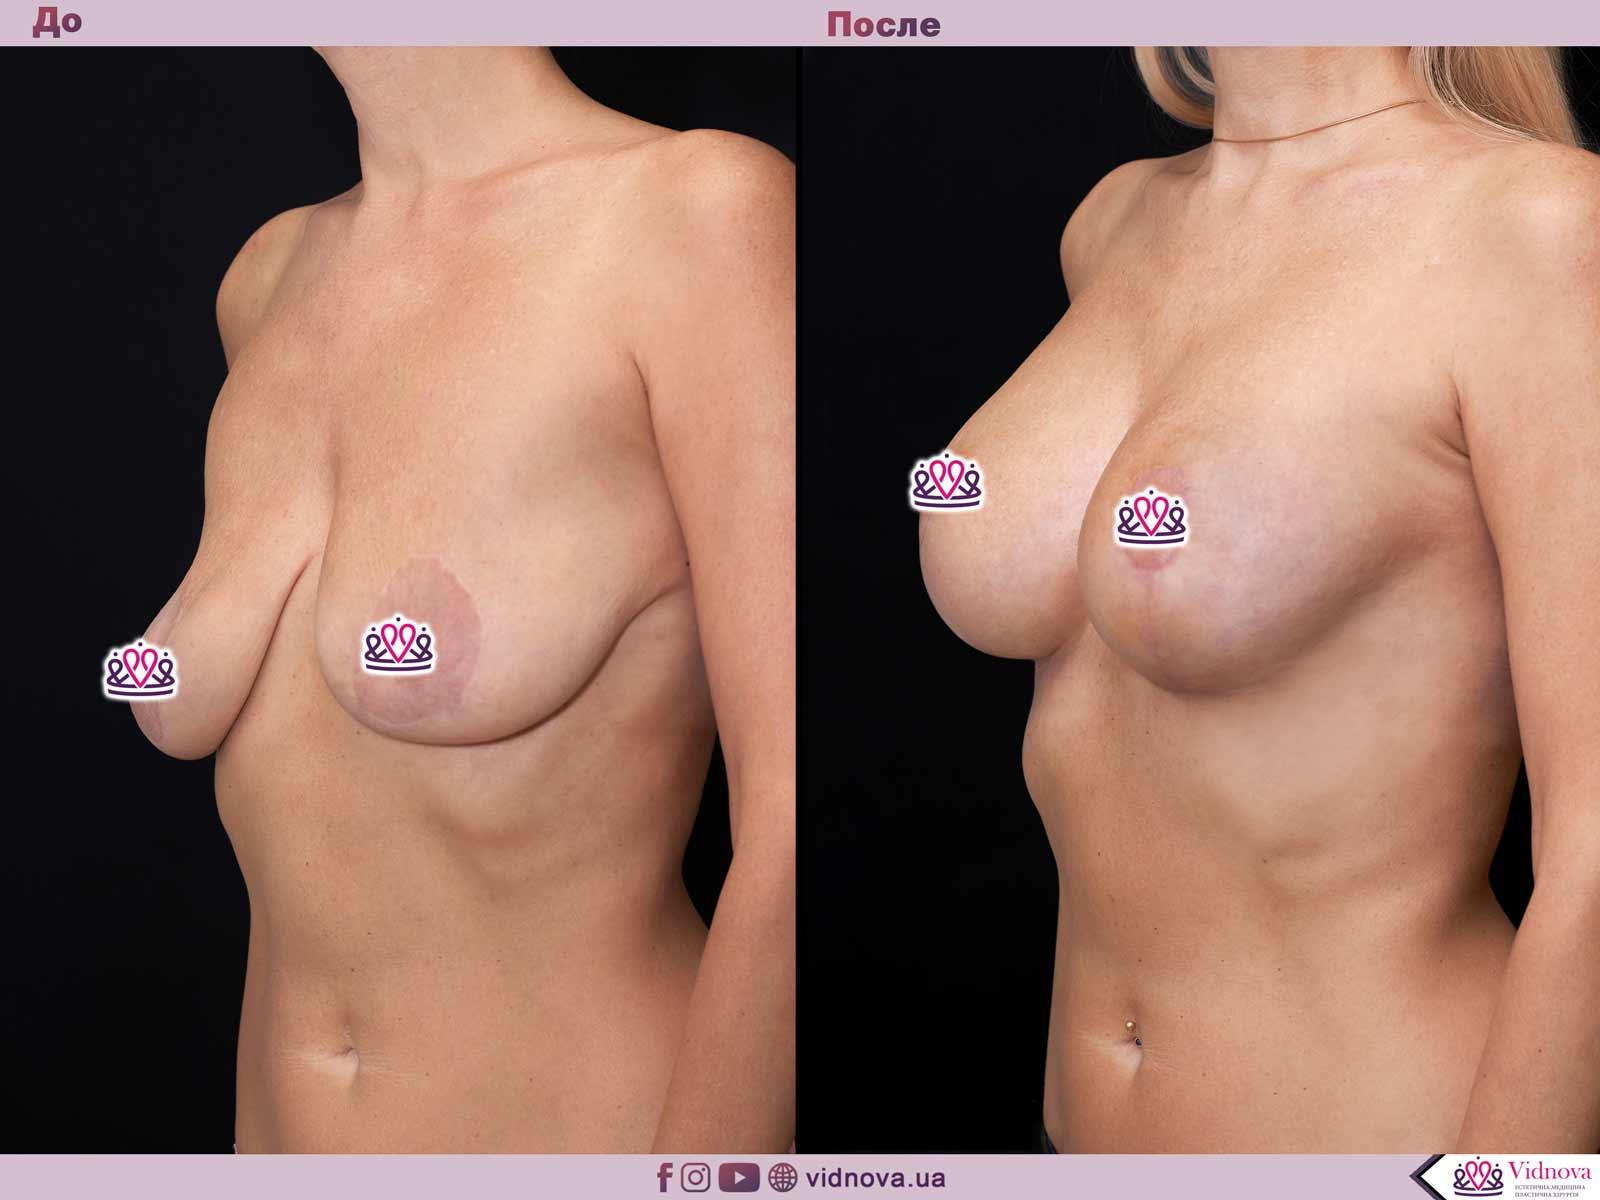 Подтяжка груди: Фото ДО и ПОСЛЕ - Пример №20-2 - Клиника Vidnova